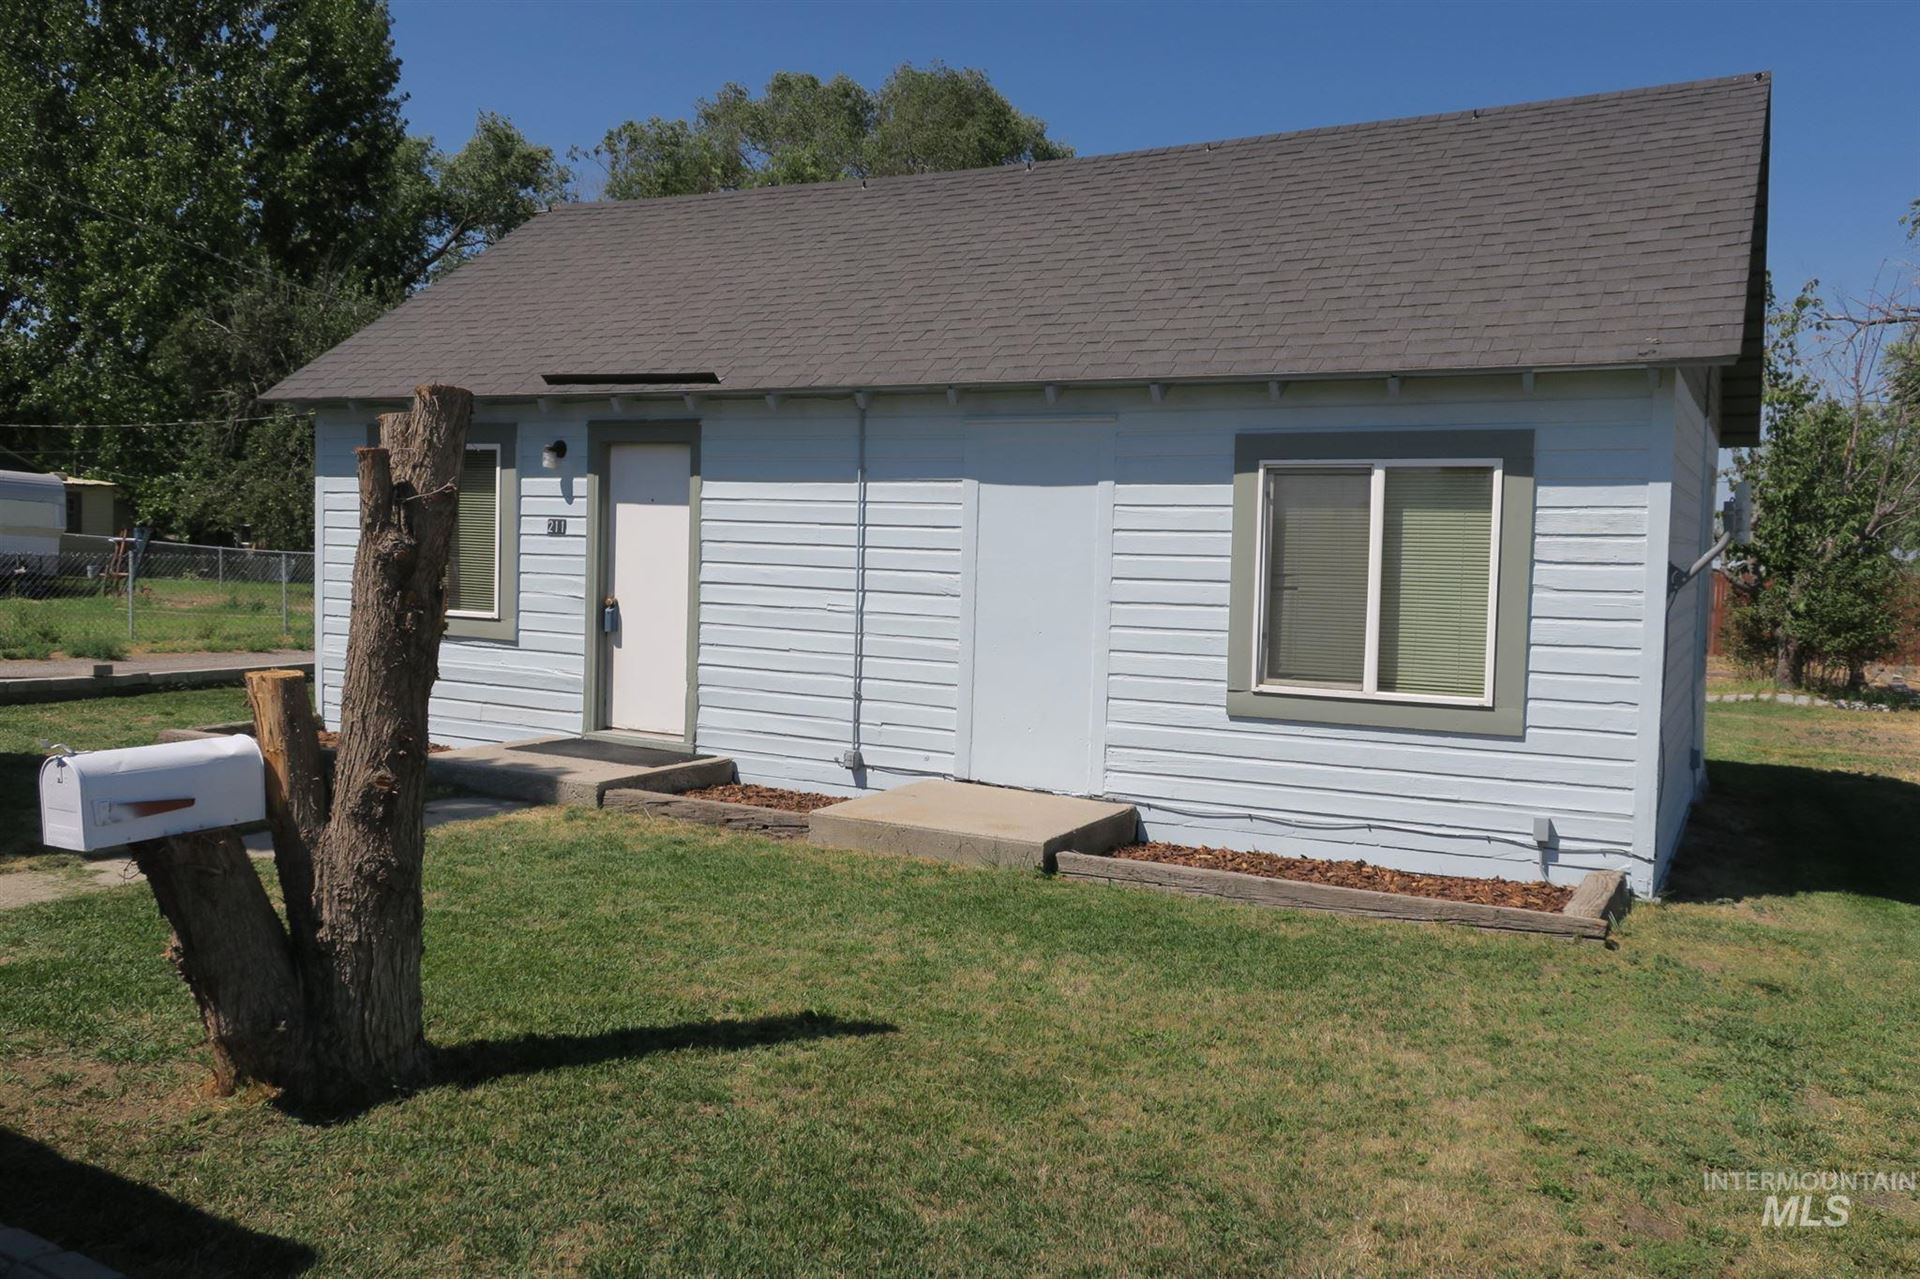 Photo of 211 S Elm Street, Jerome, ID 83338-0001 (MLS # 98775909)